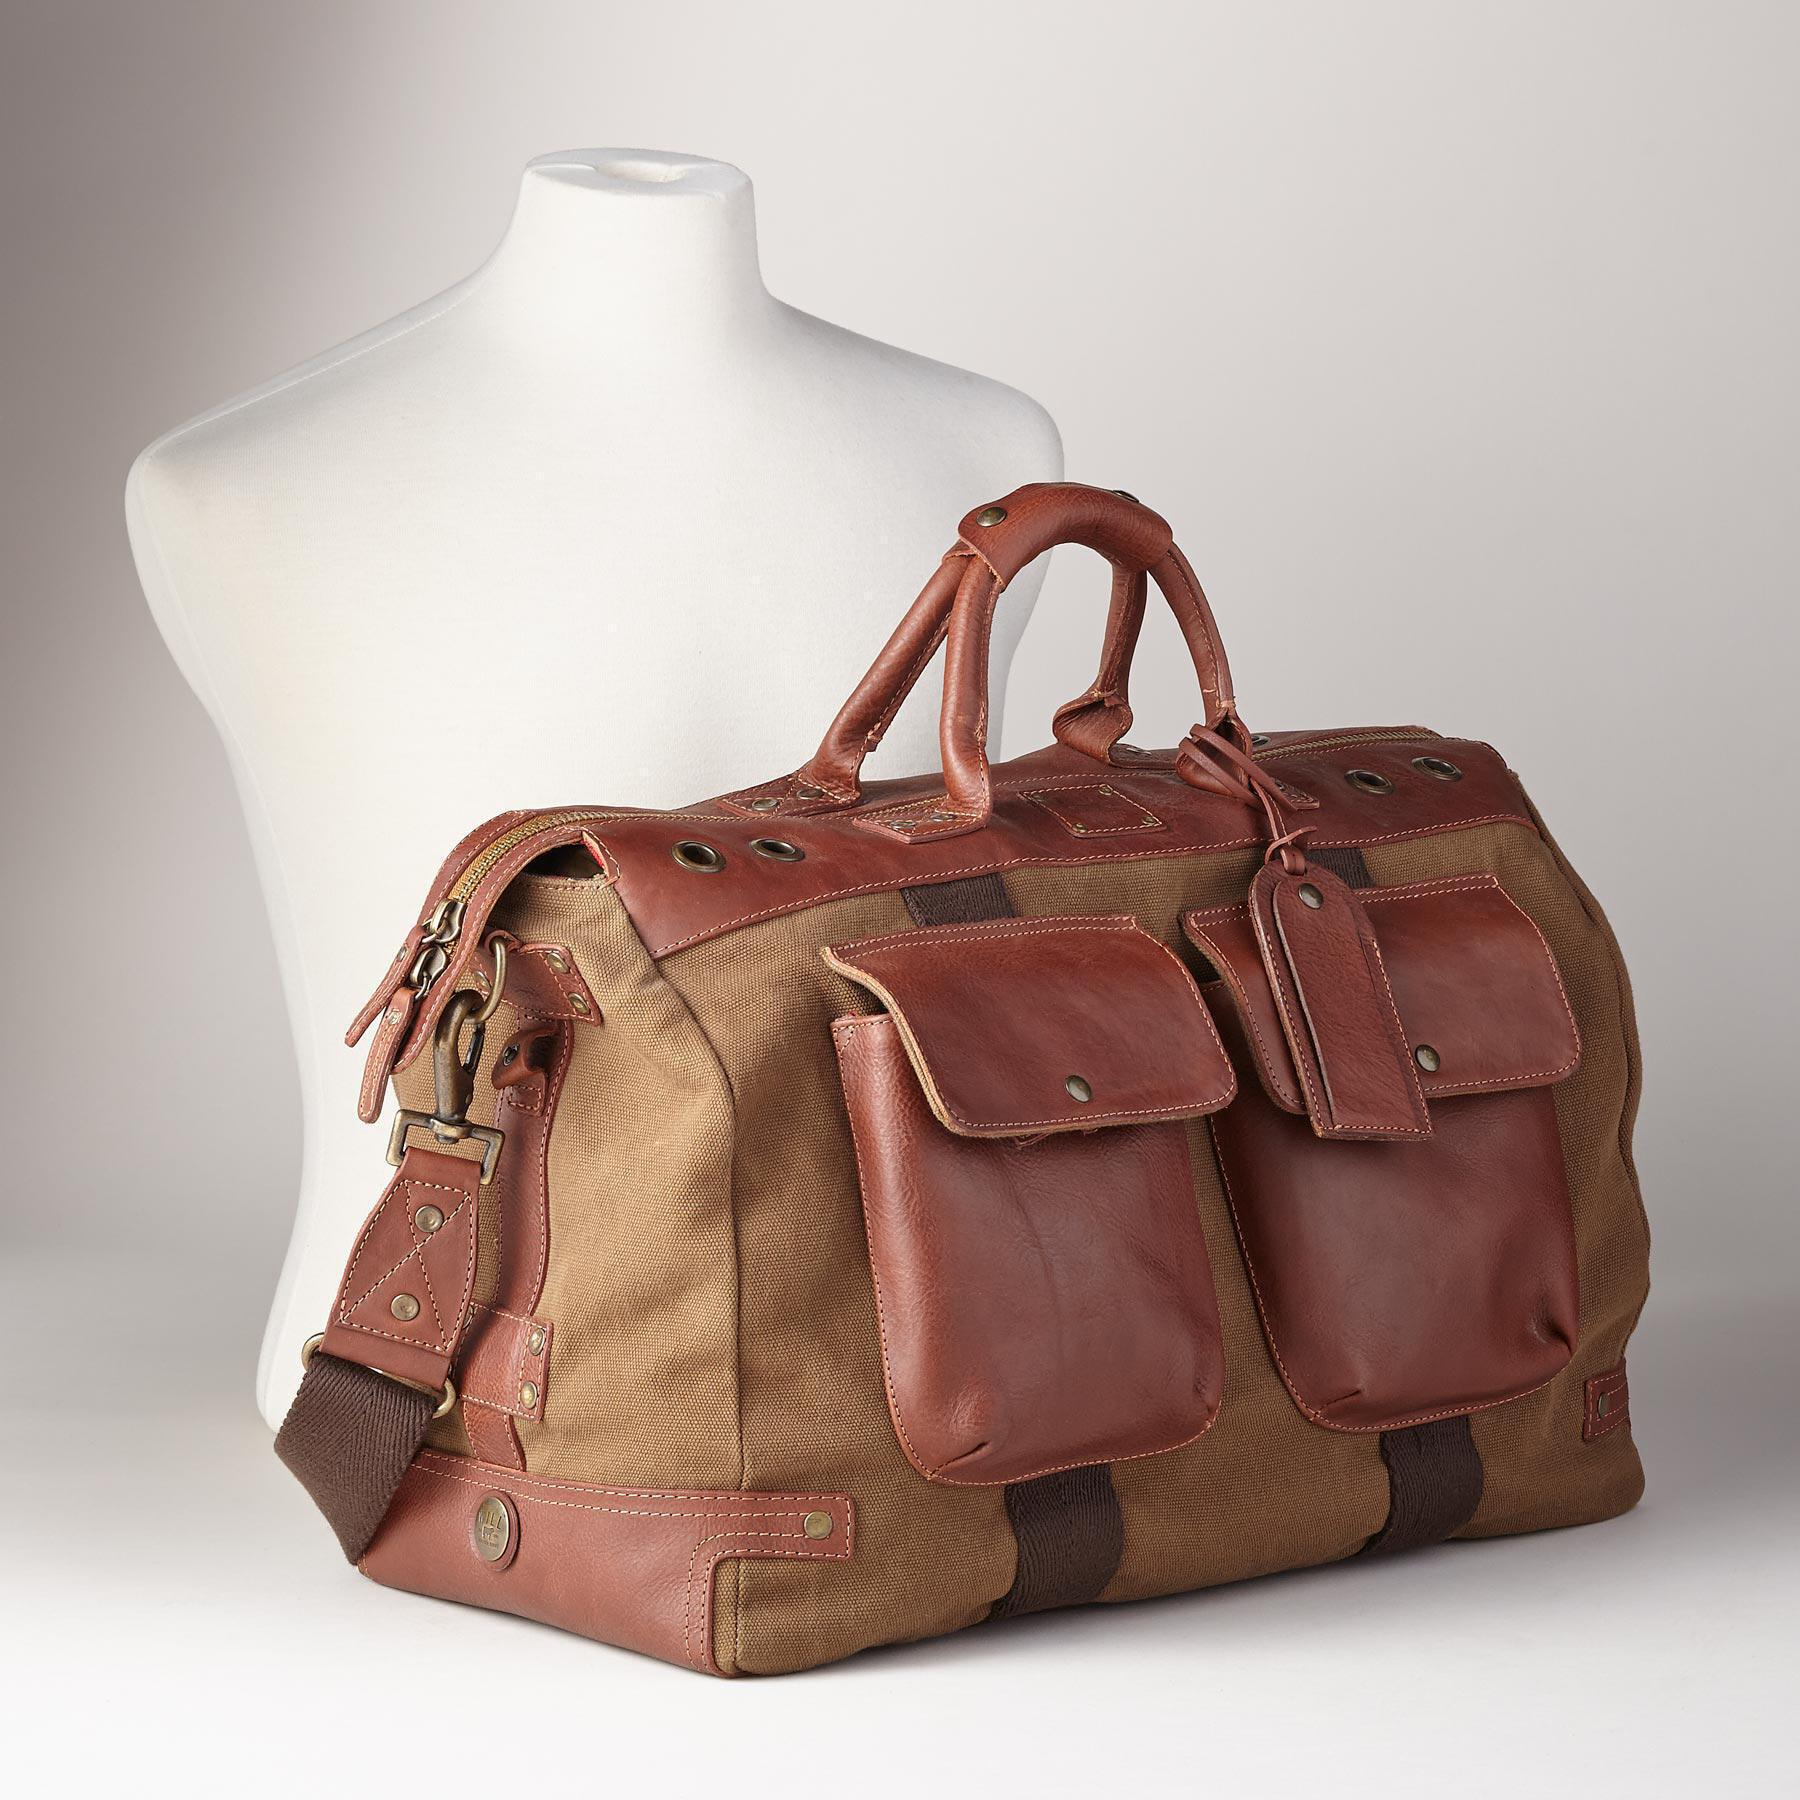 Venerations Duffle Bag: View 4